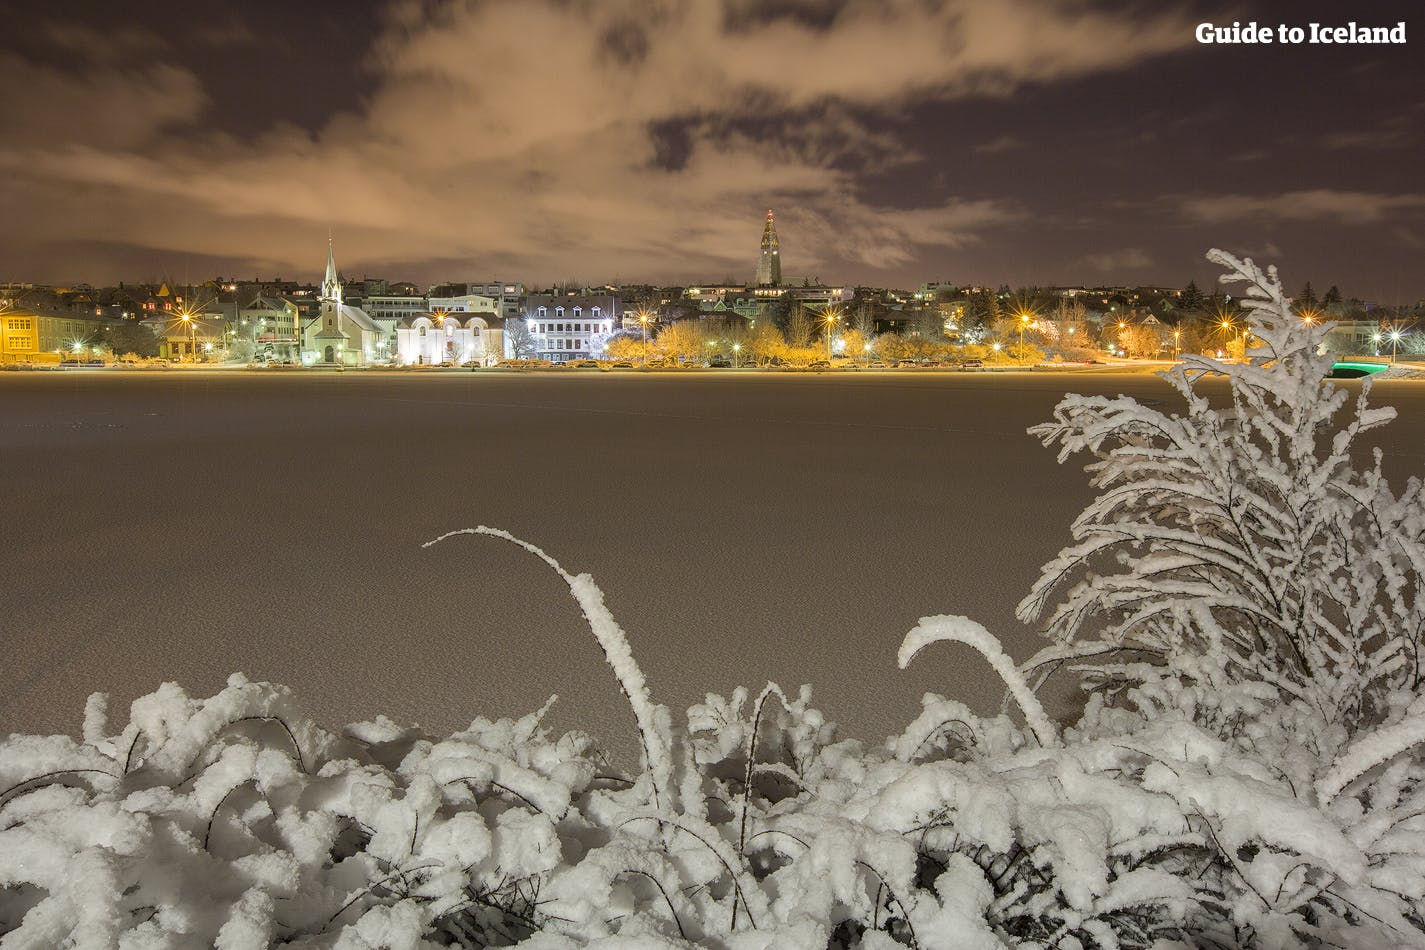 De straatlantaarns van Reykjavík die de donkere winterhemel verlichten.